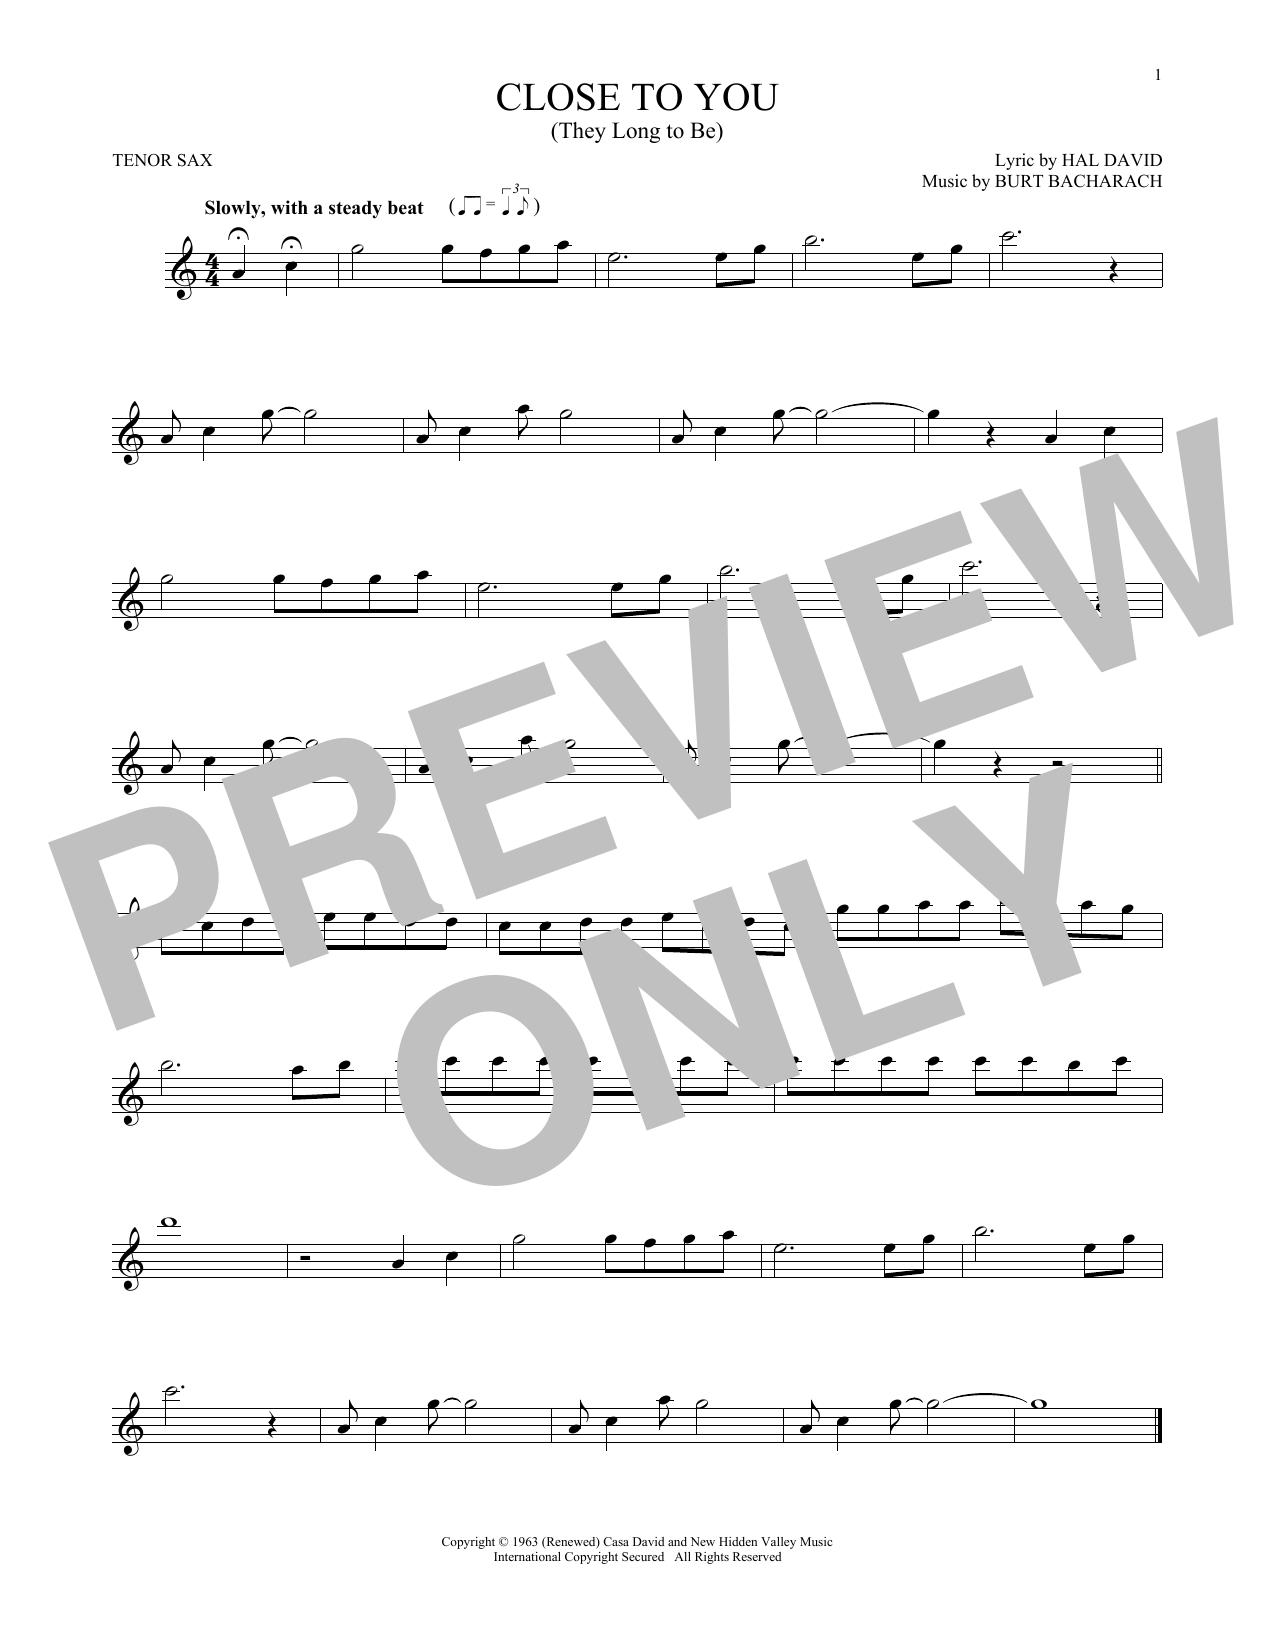 Sheet Music Digital Files To Print Licensed The Carpenters Digital